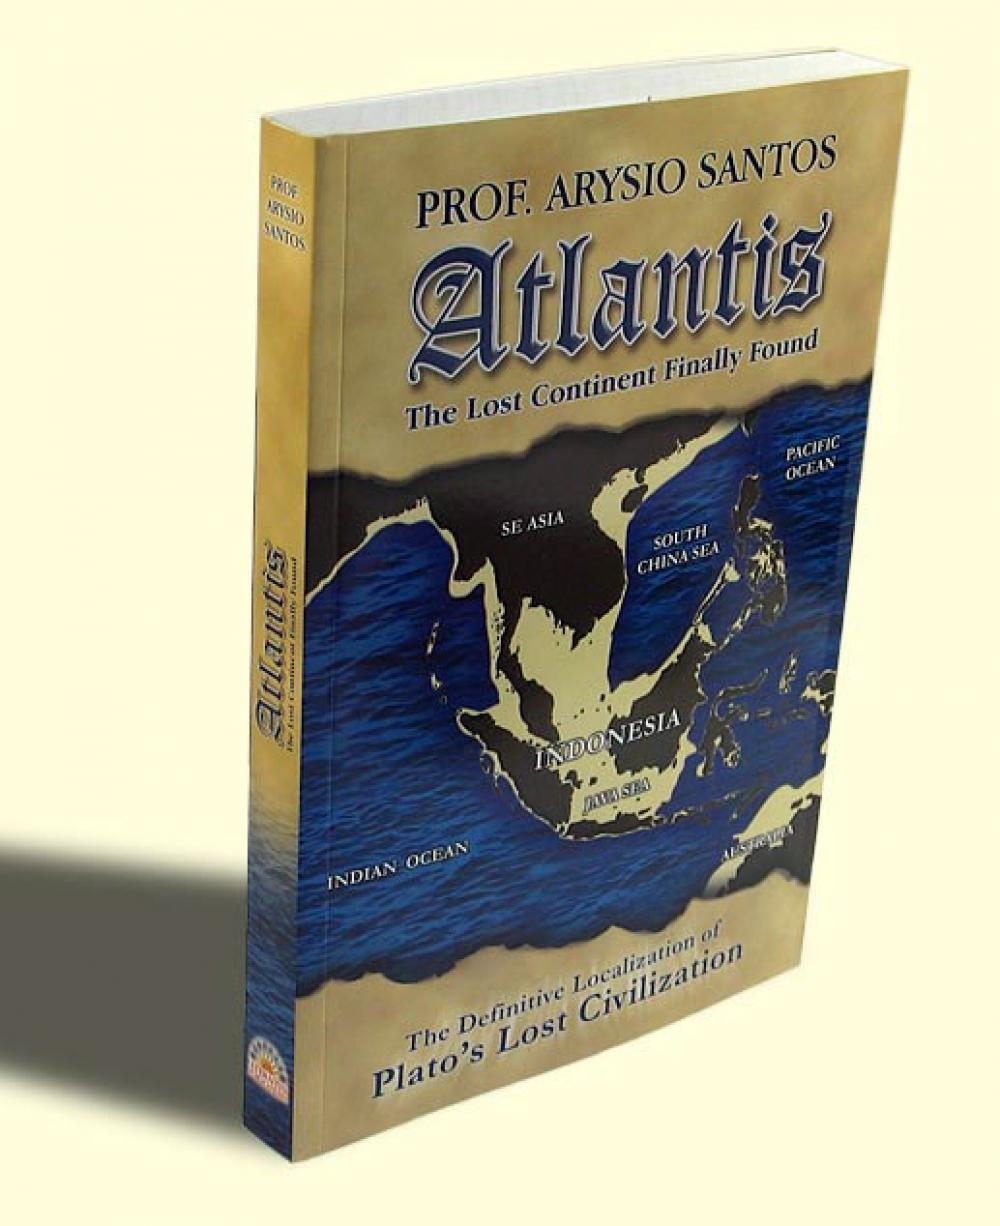 The Lost Atlantis Finally